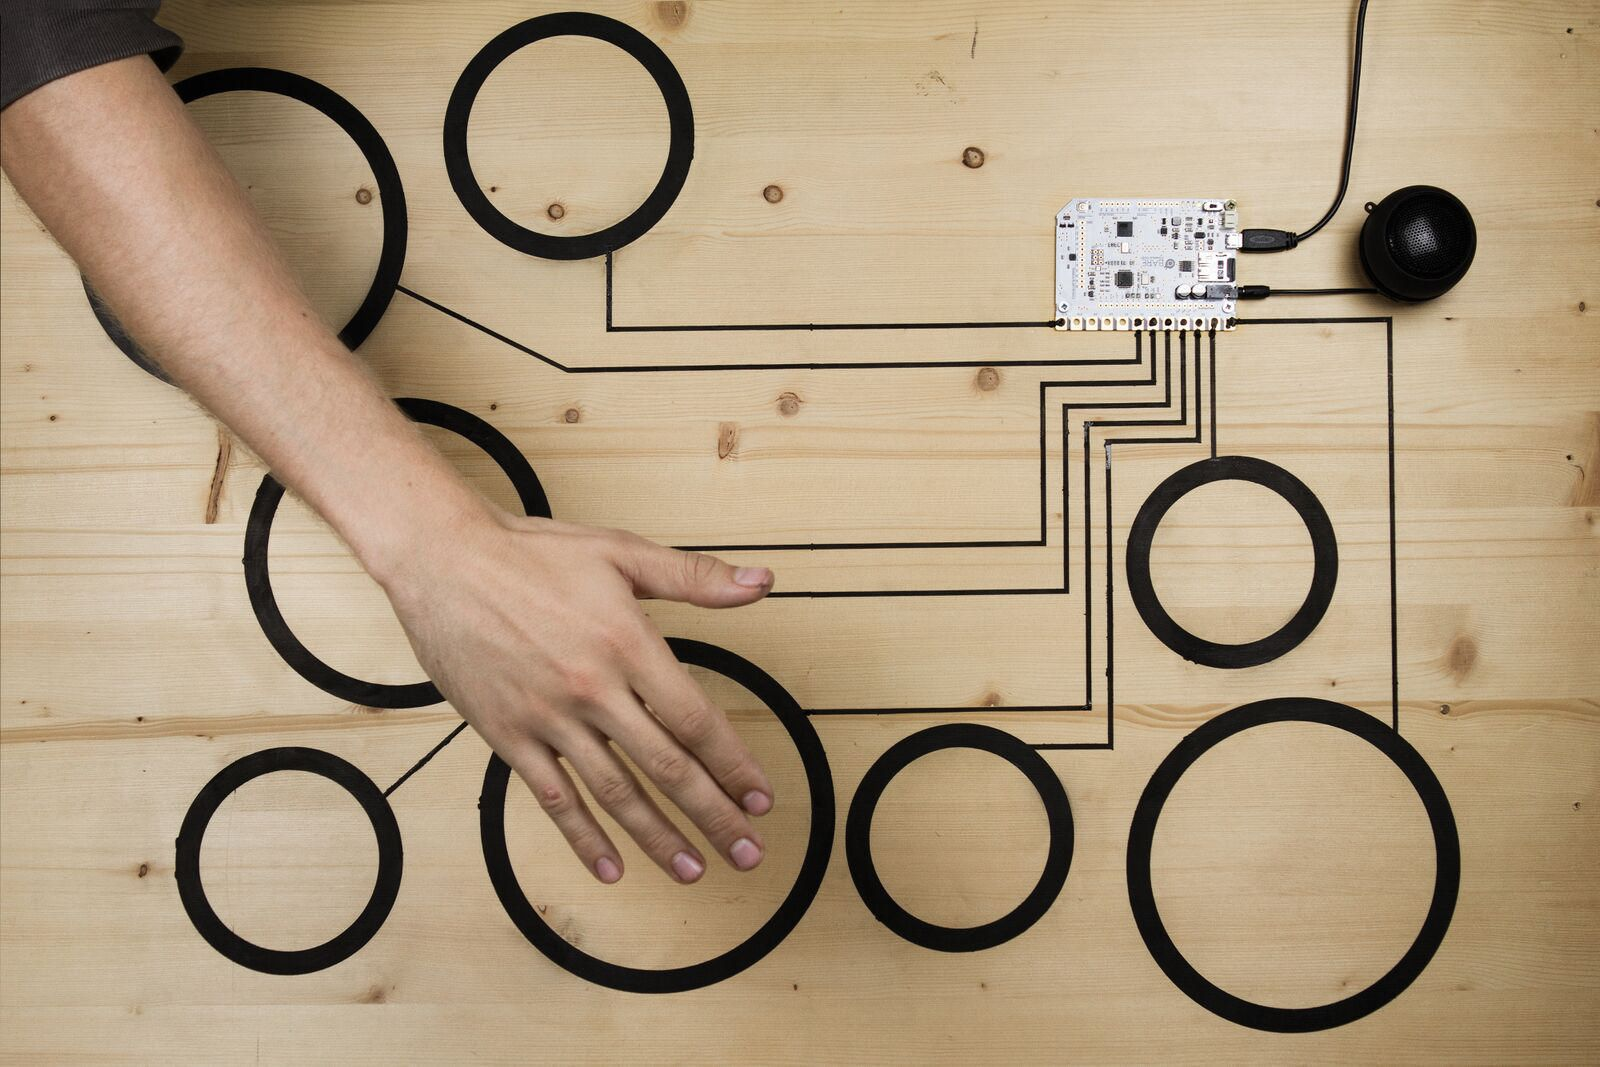 Bare-Conductive-Touch-Board-N-008.xxl3.jpg